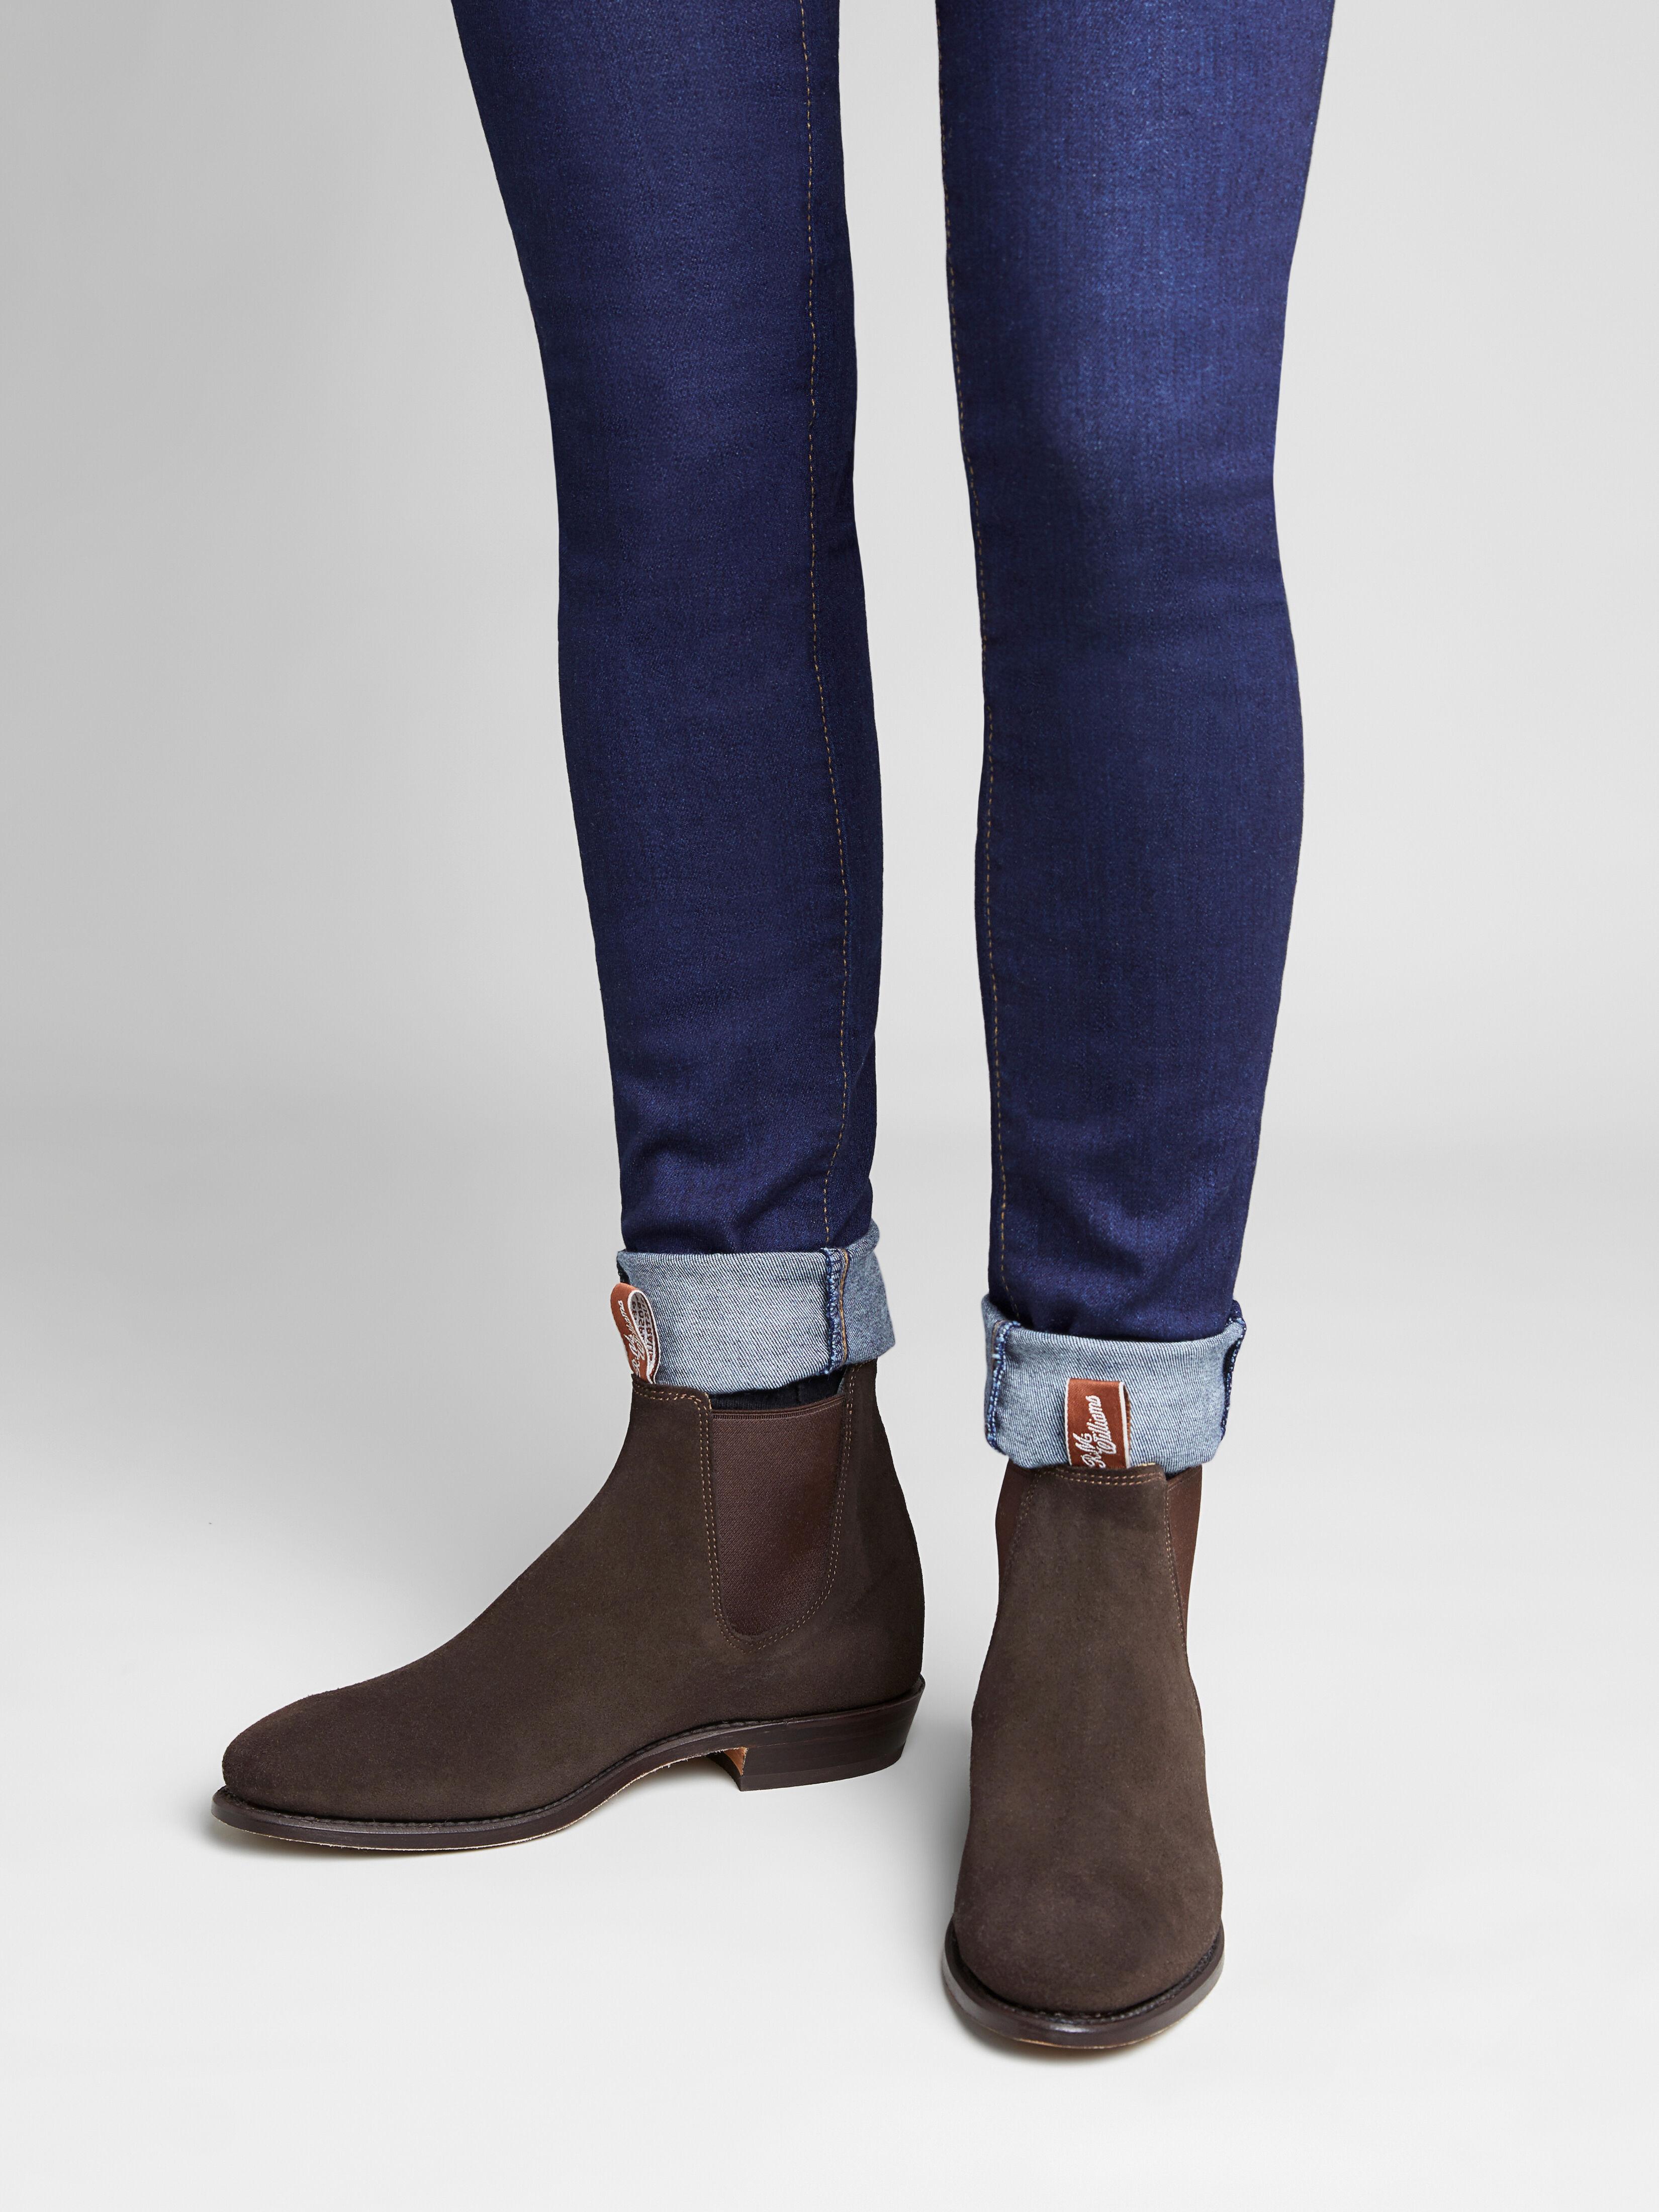 Women's Handcrafted Footwear | R.M.Williams®